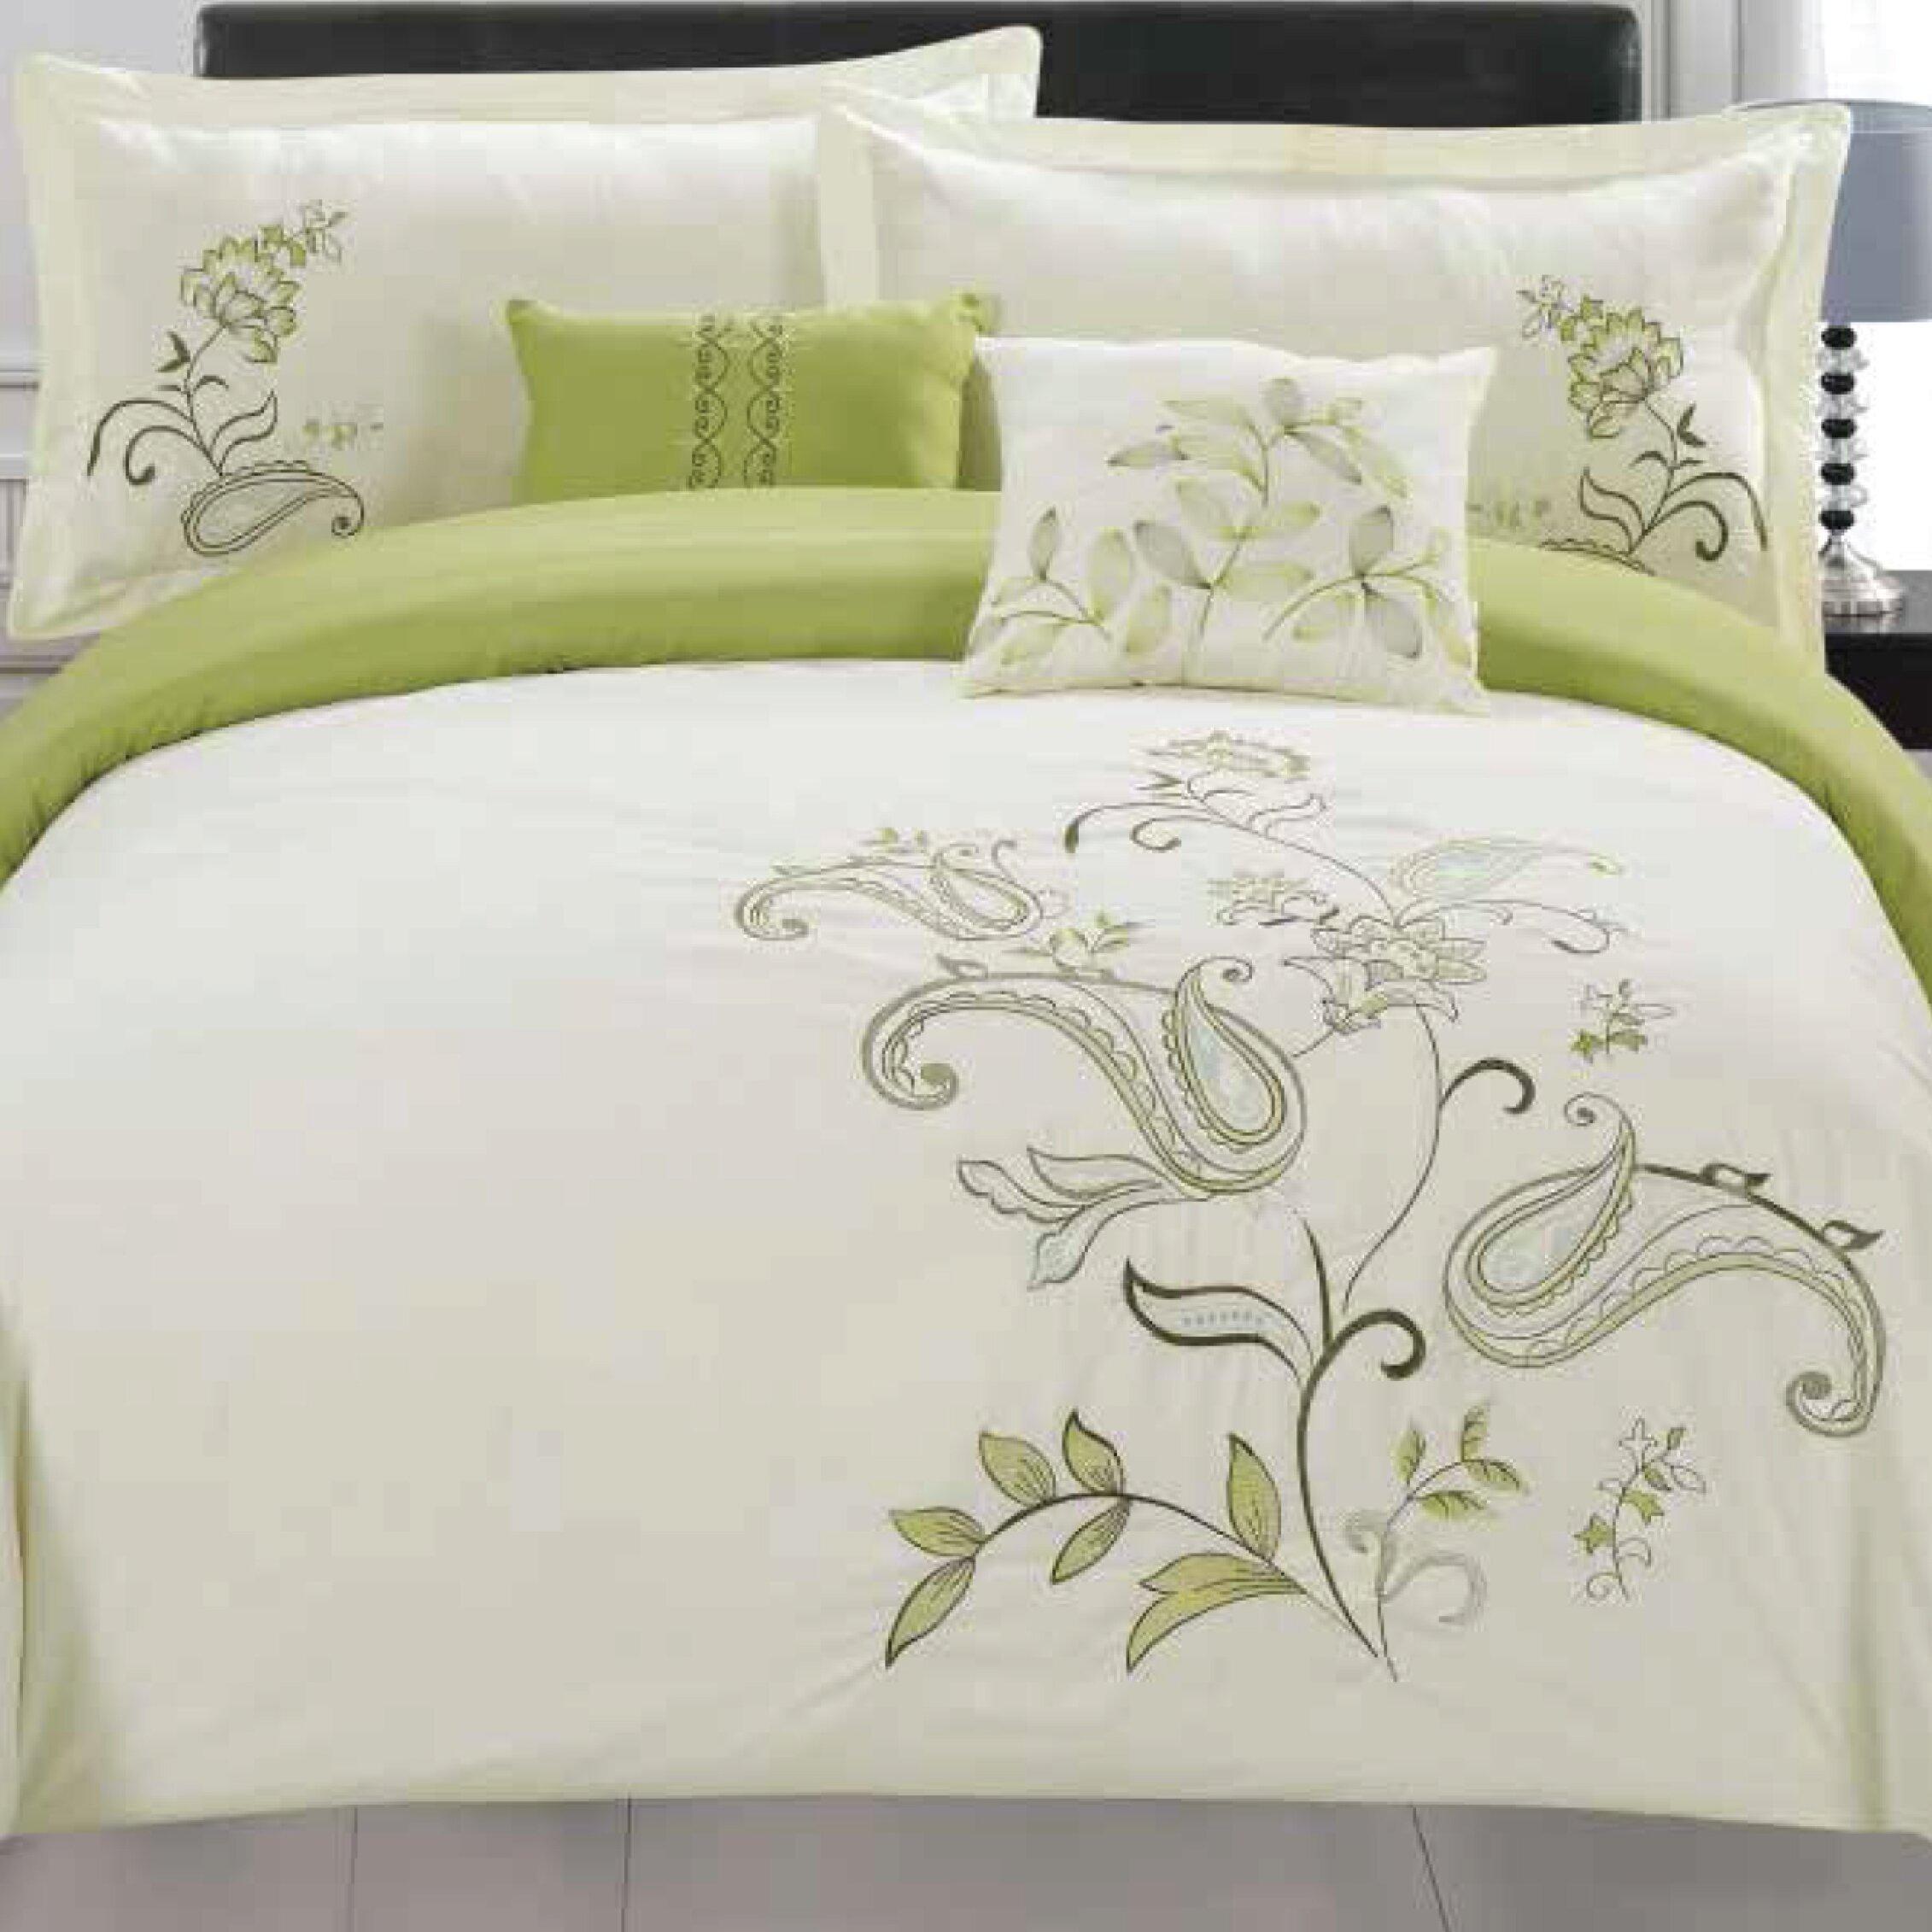 Jordan Furniture Mattress Sale RT Designer's Collection Jordana 5 Piece Comforter Set ...